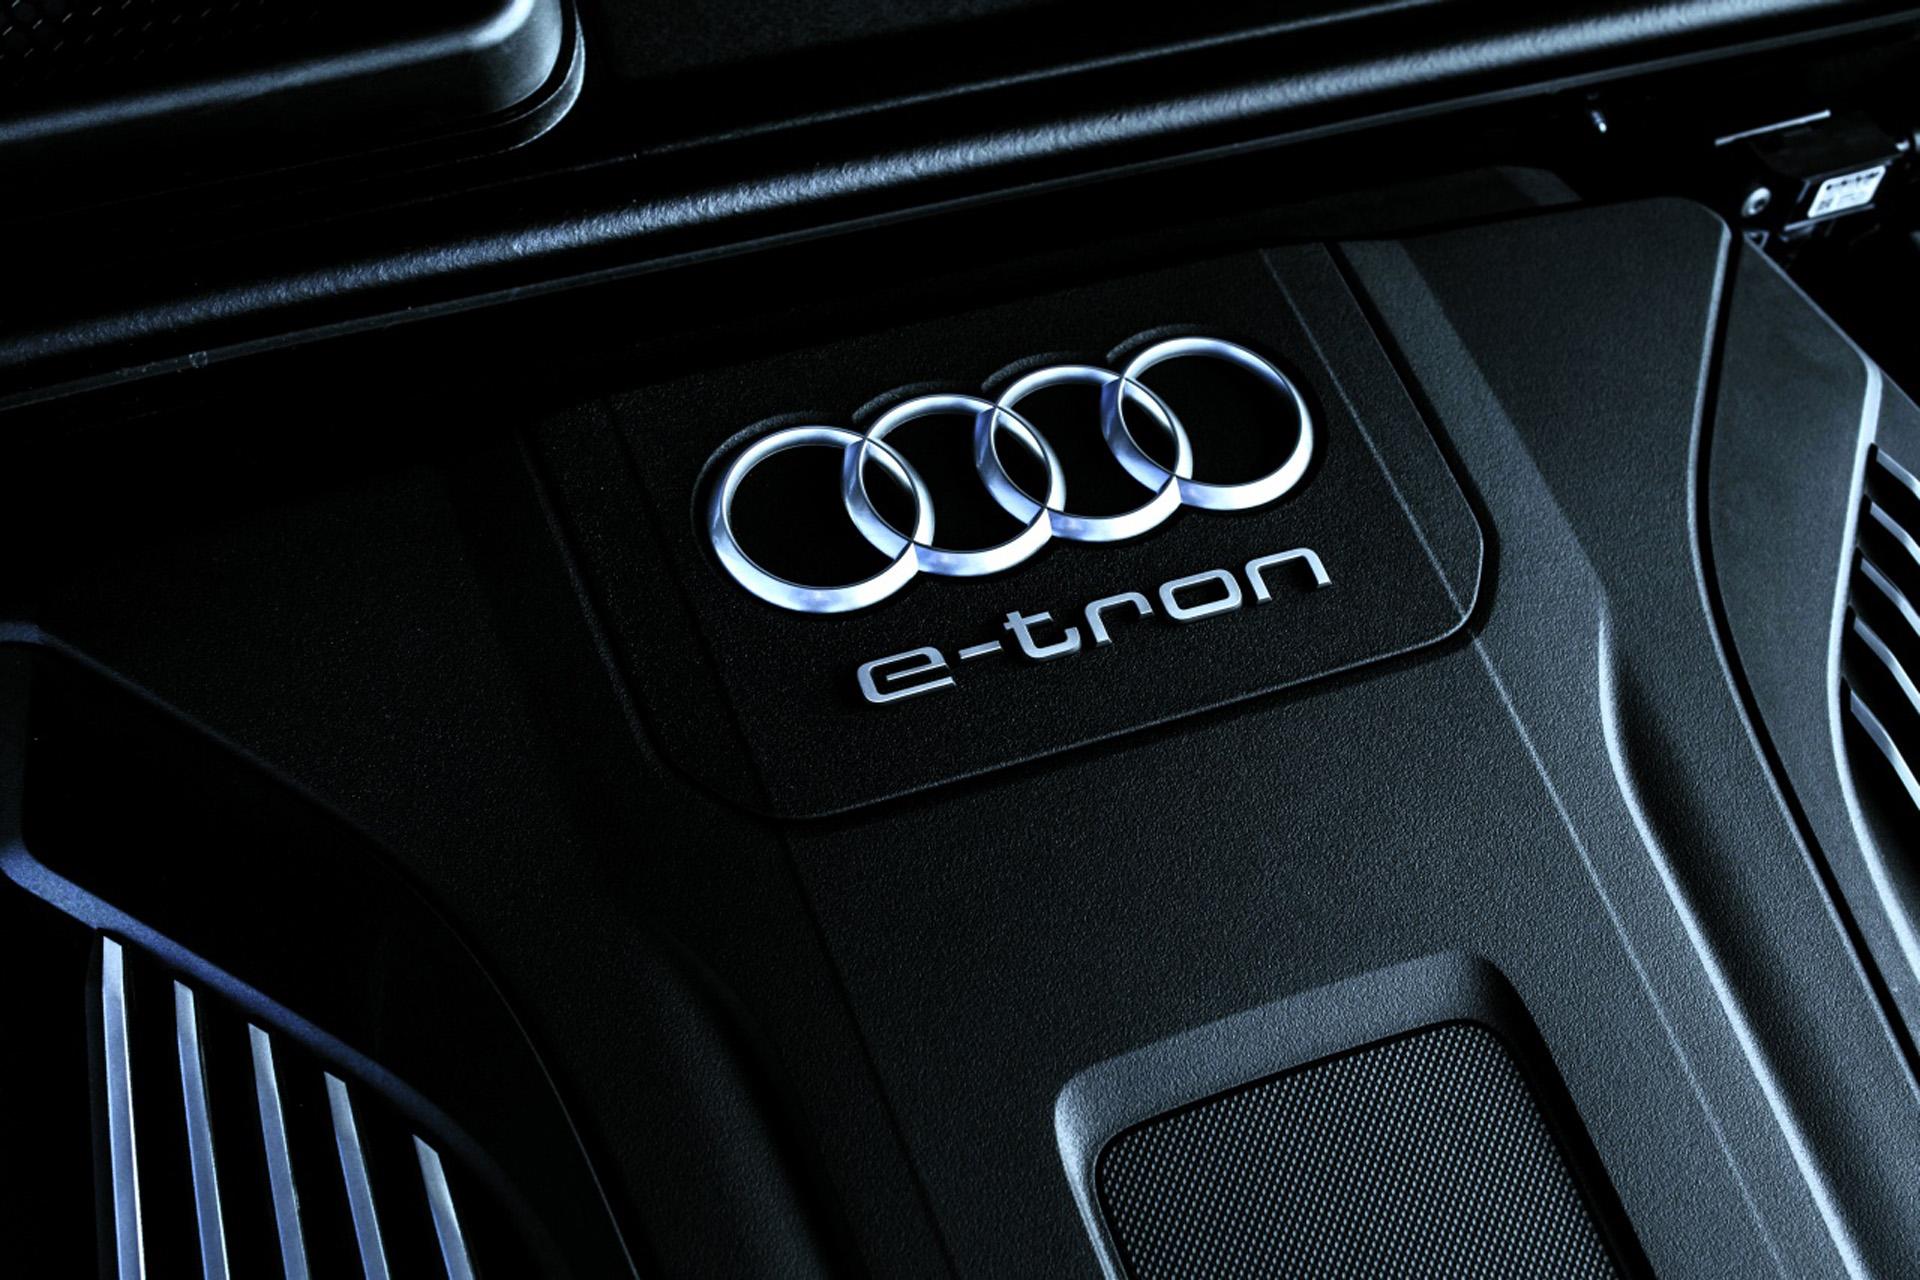 Audi 3.0 T >> image005 - AUTO BILD